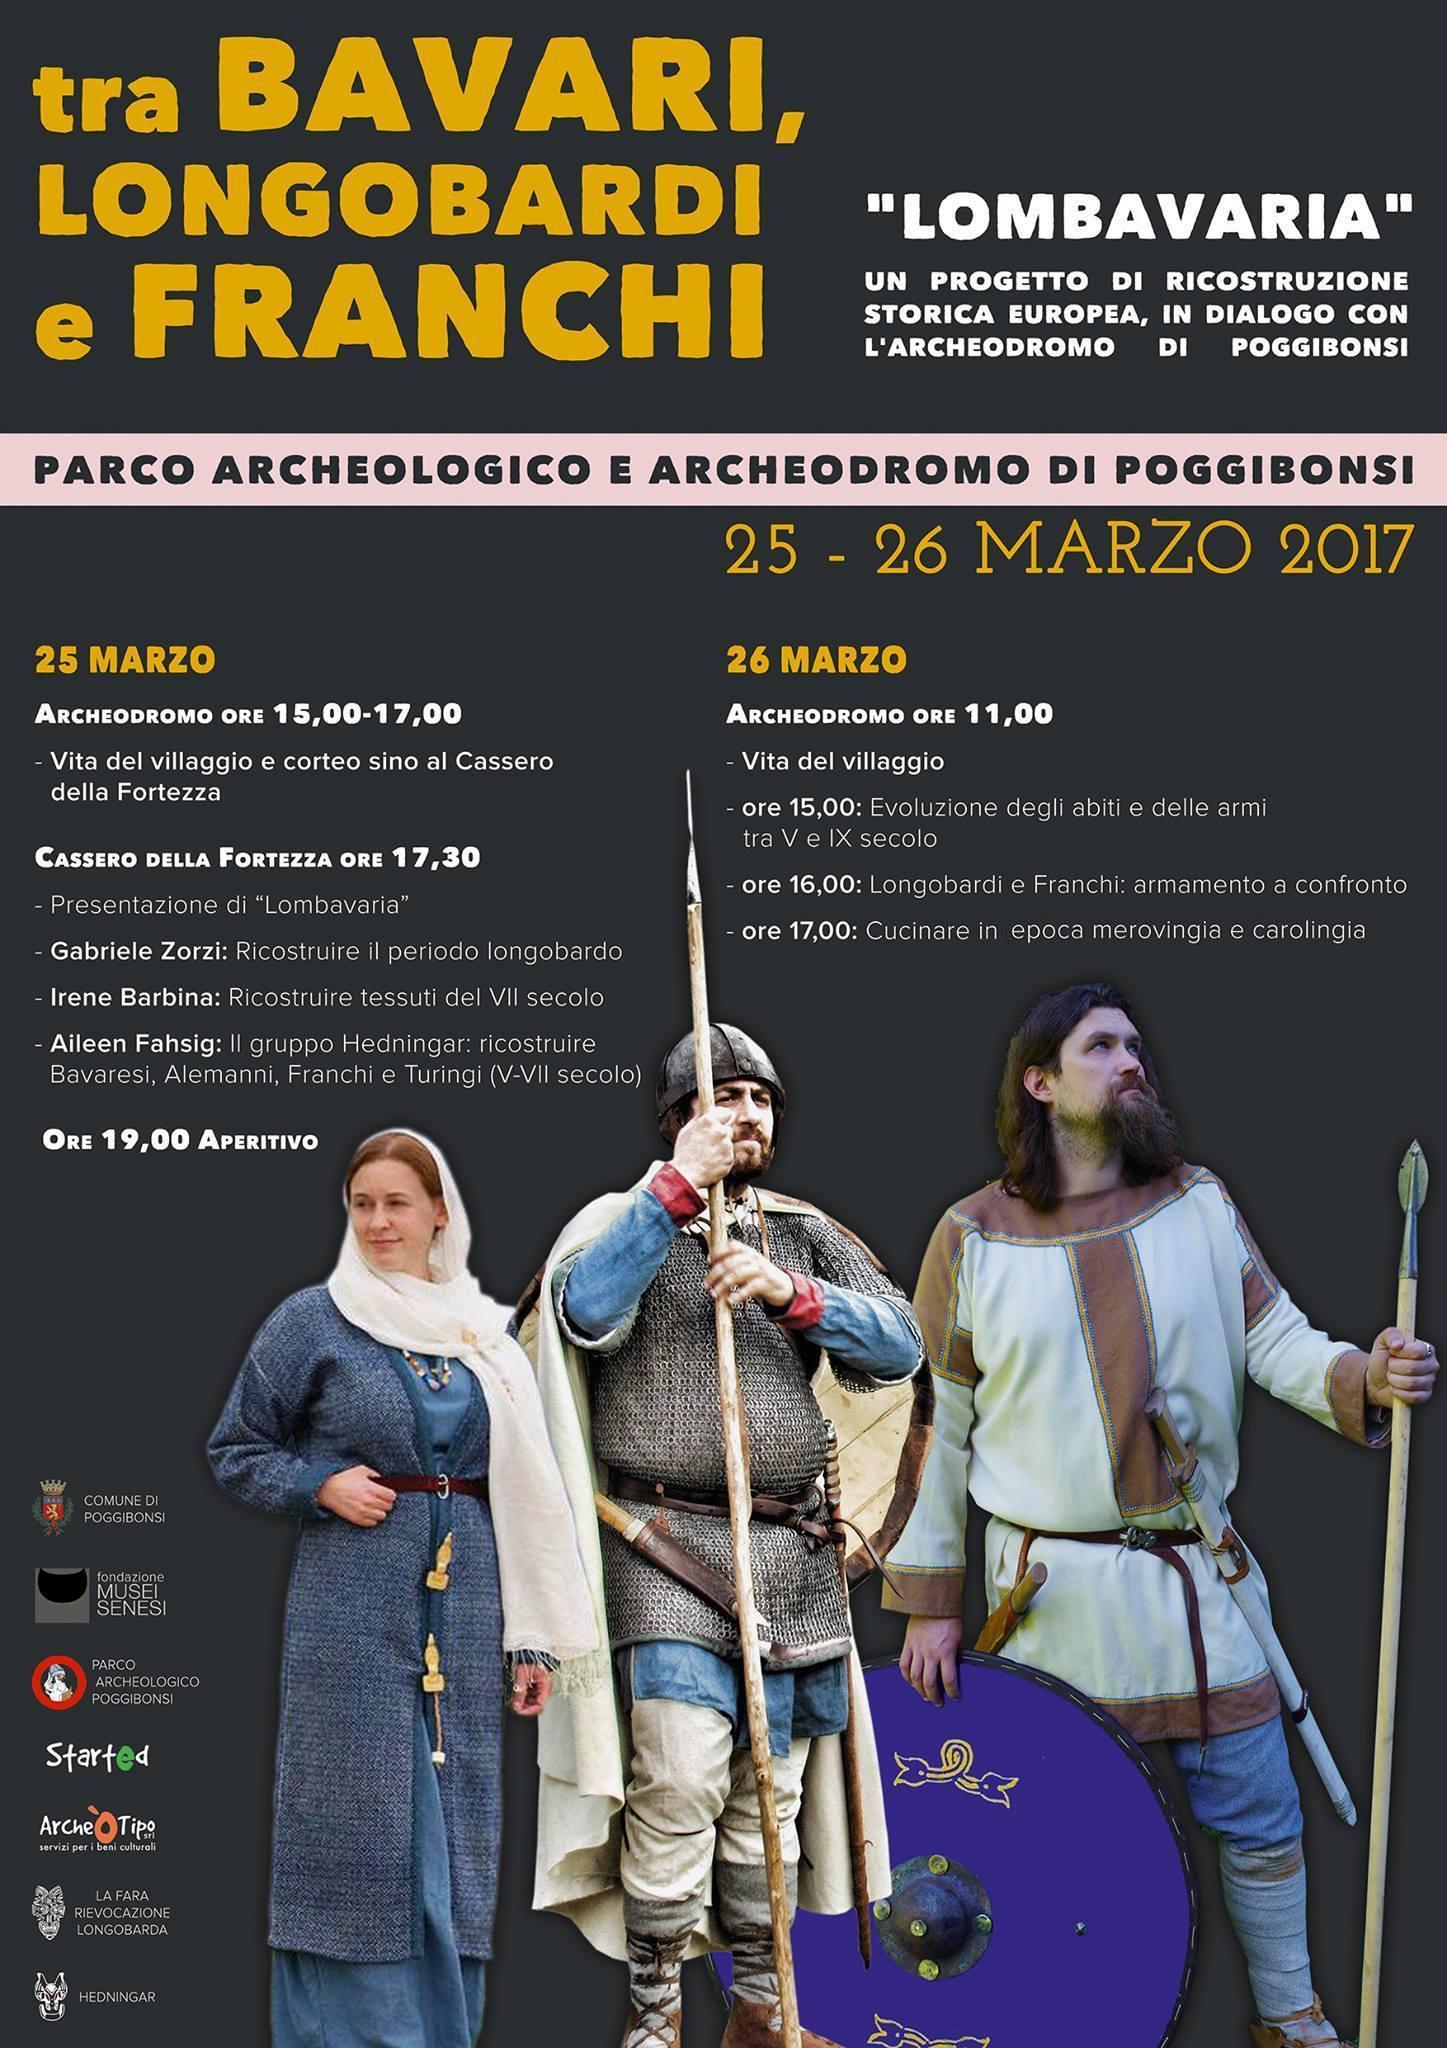 Lombavaria. Tra Bavari, Longobardi e Franchi (25-26 marzo 2017)